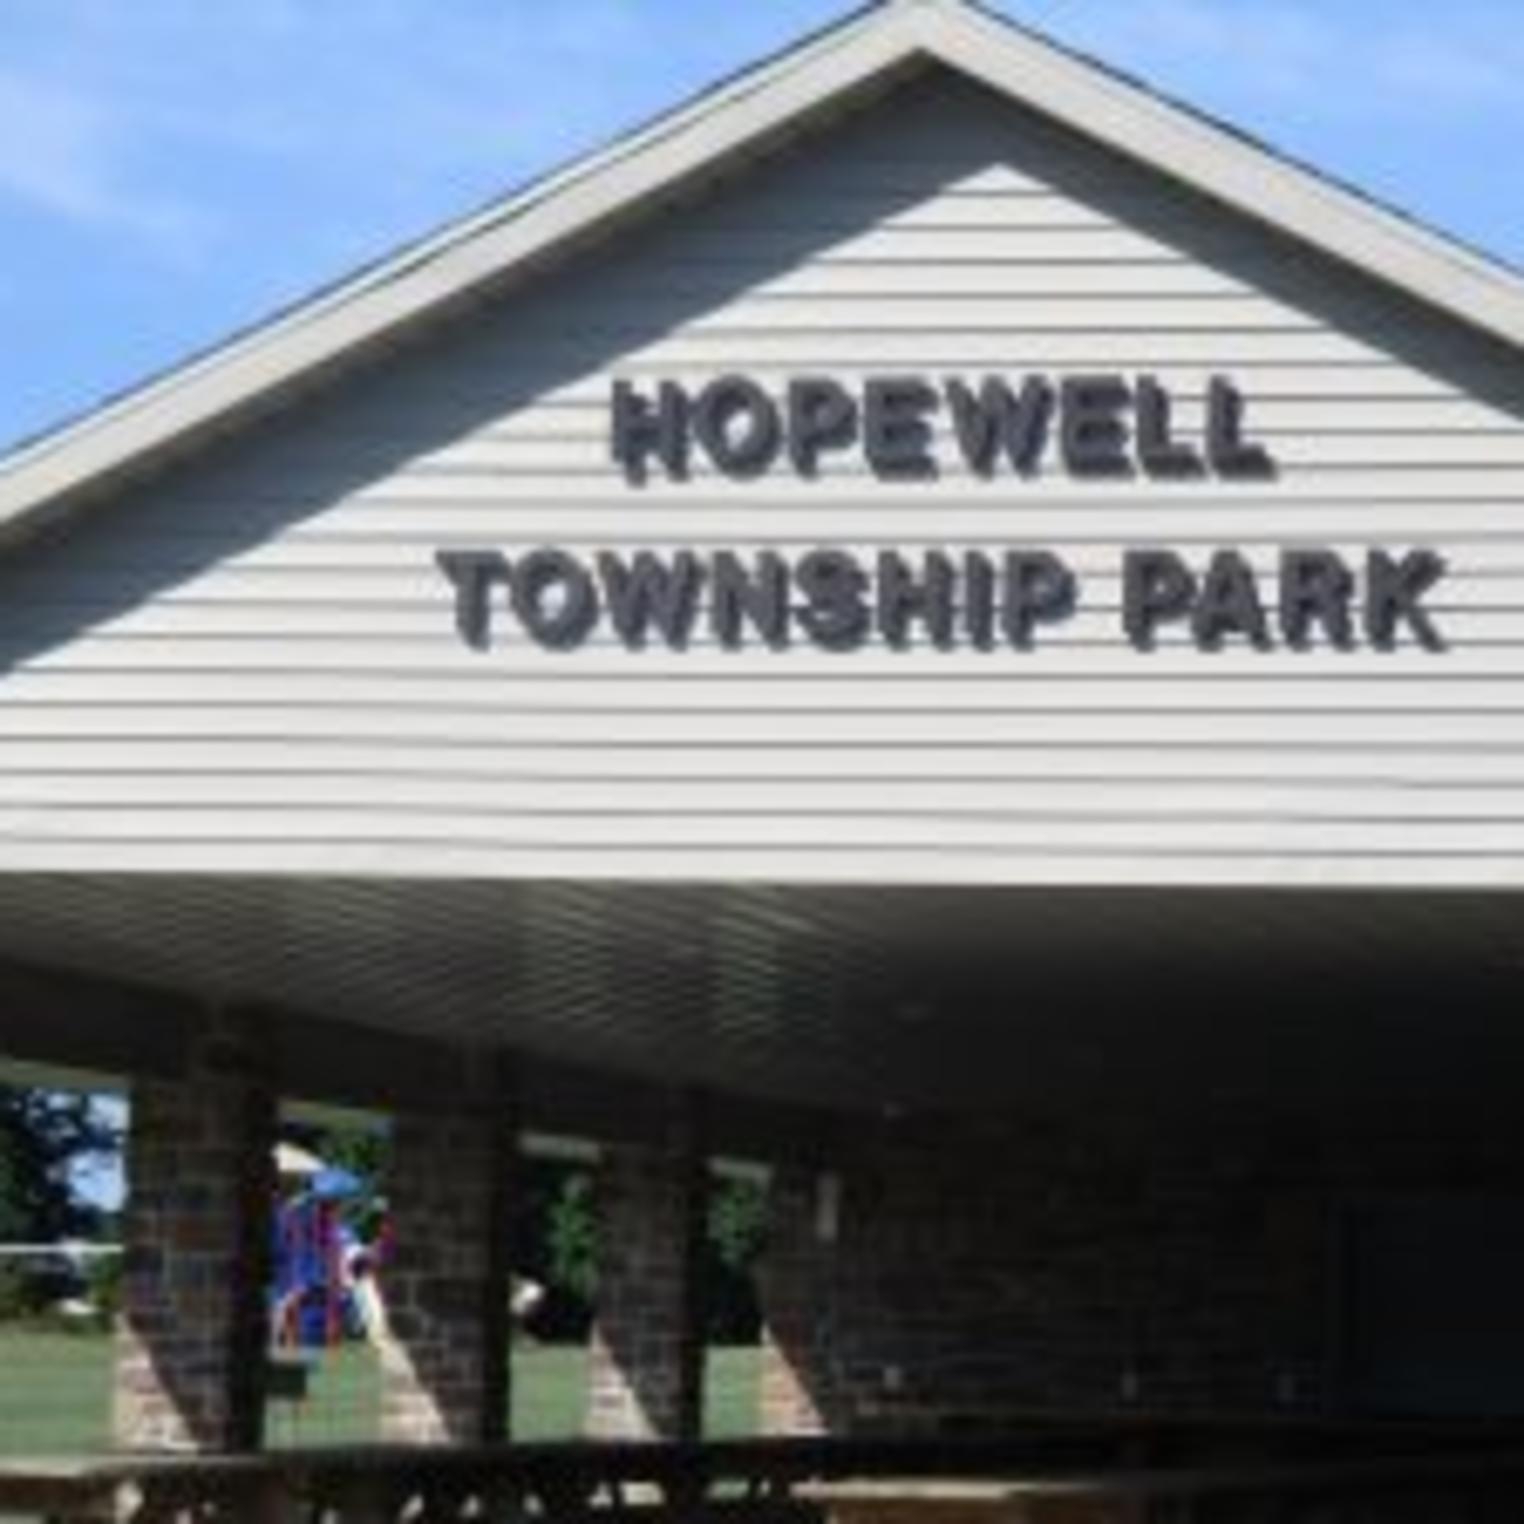 Hopewell Township Park